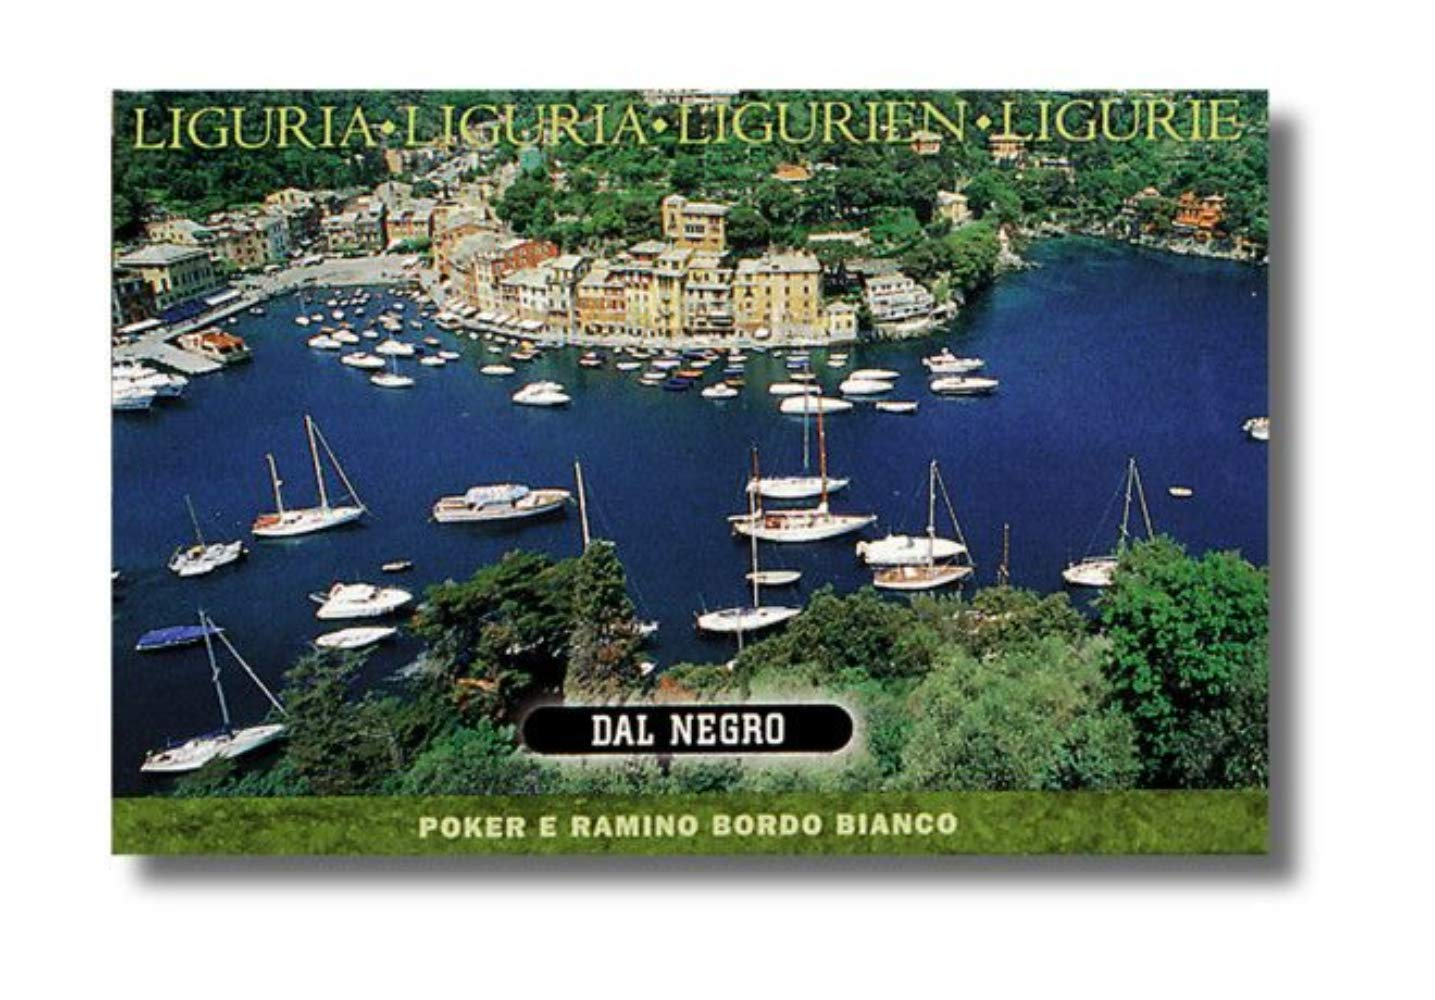 Dal Negro City of Art Liguria Poker Ramino